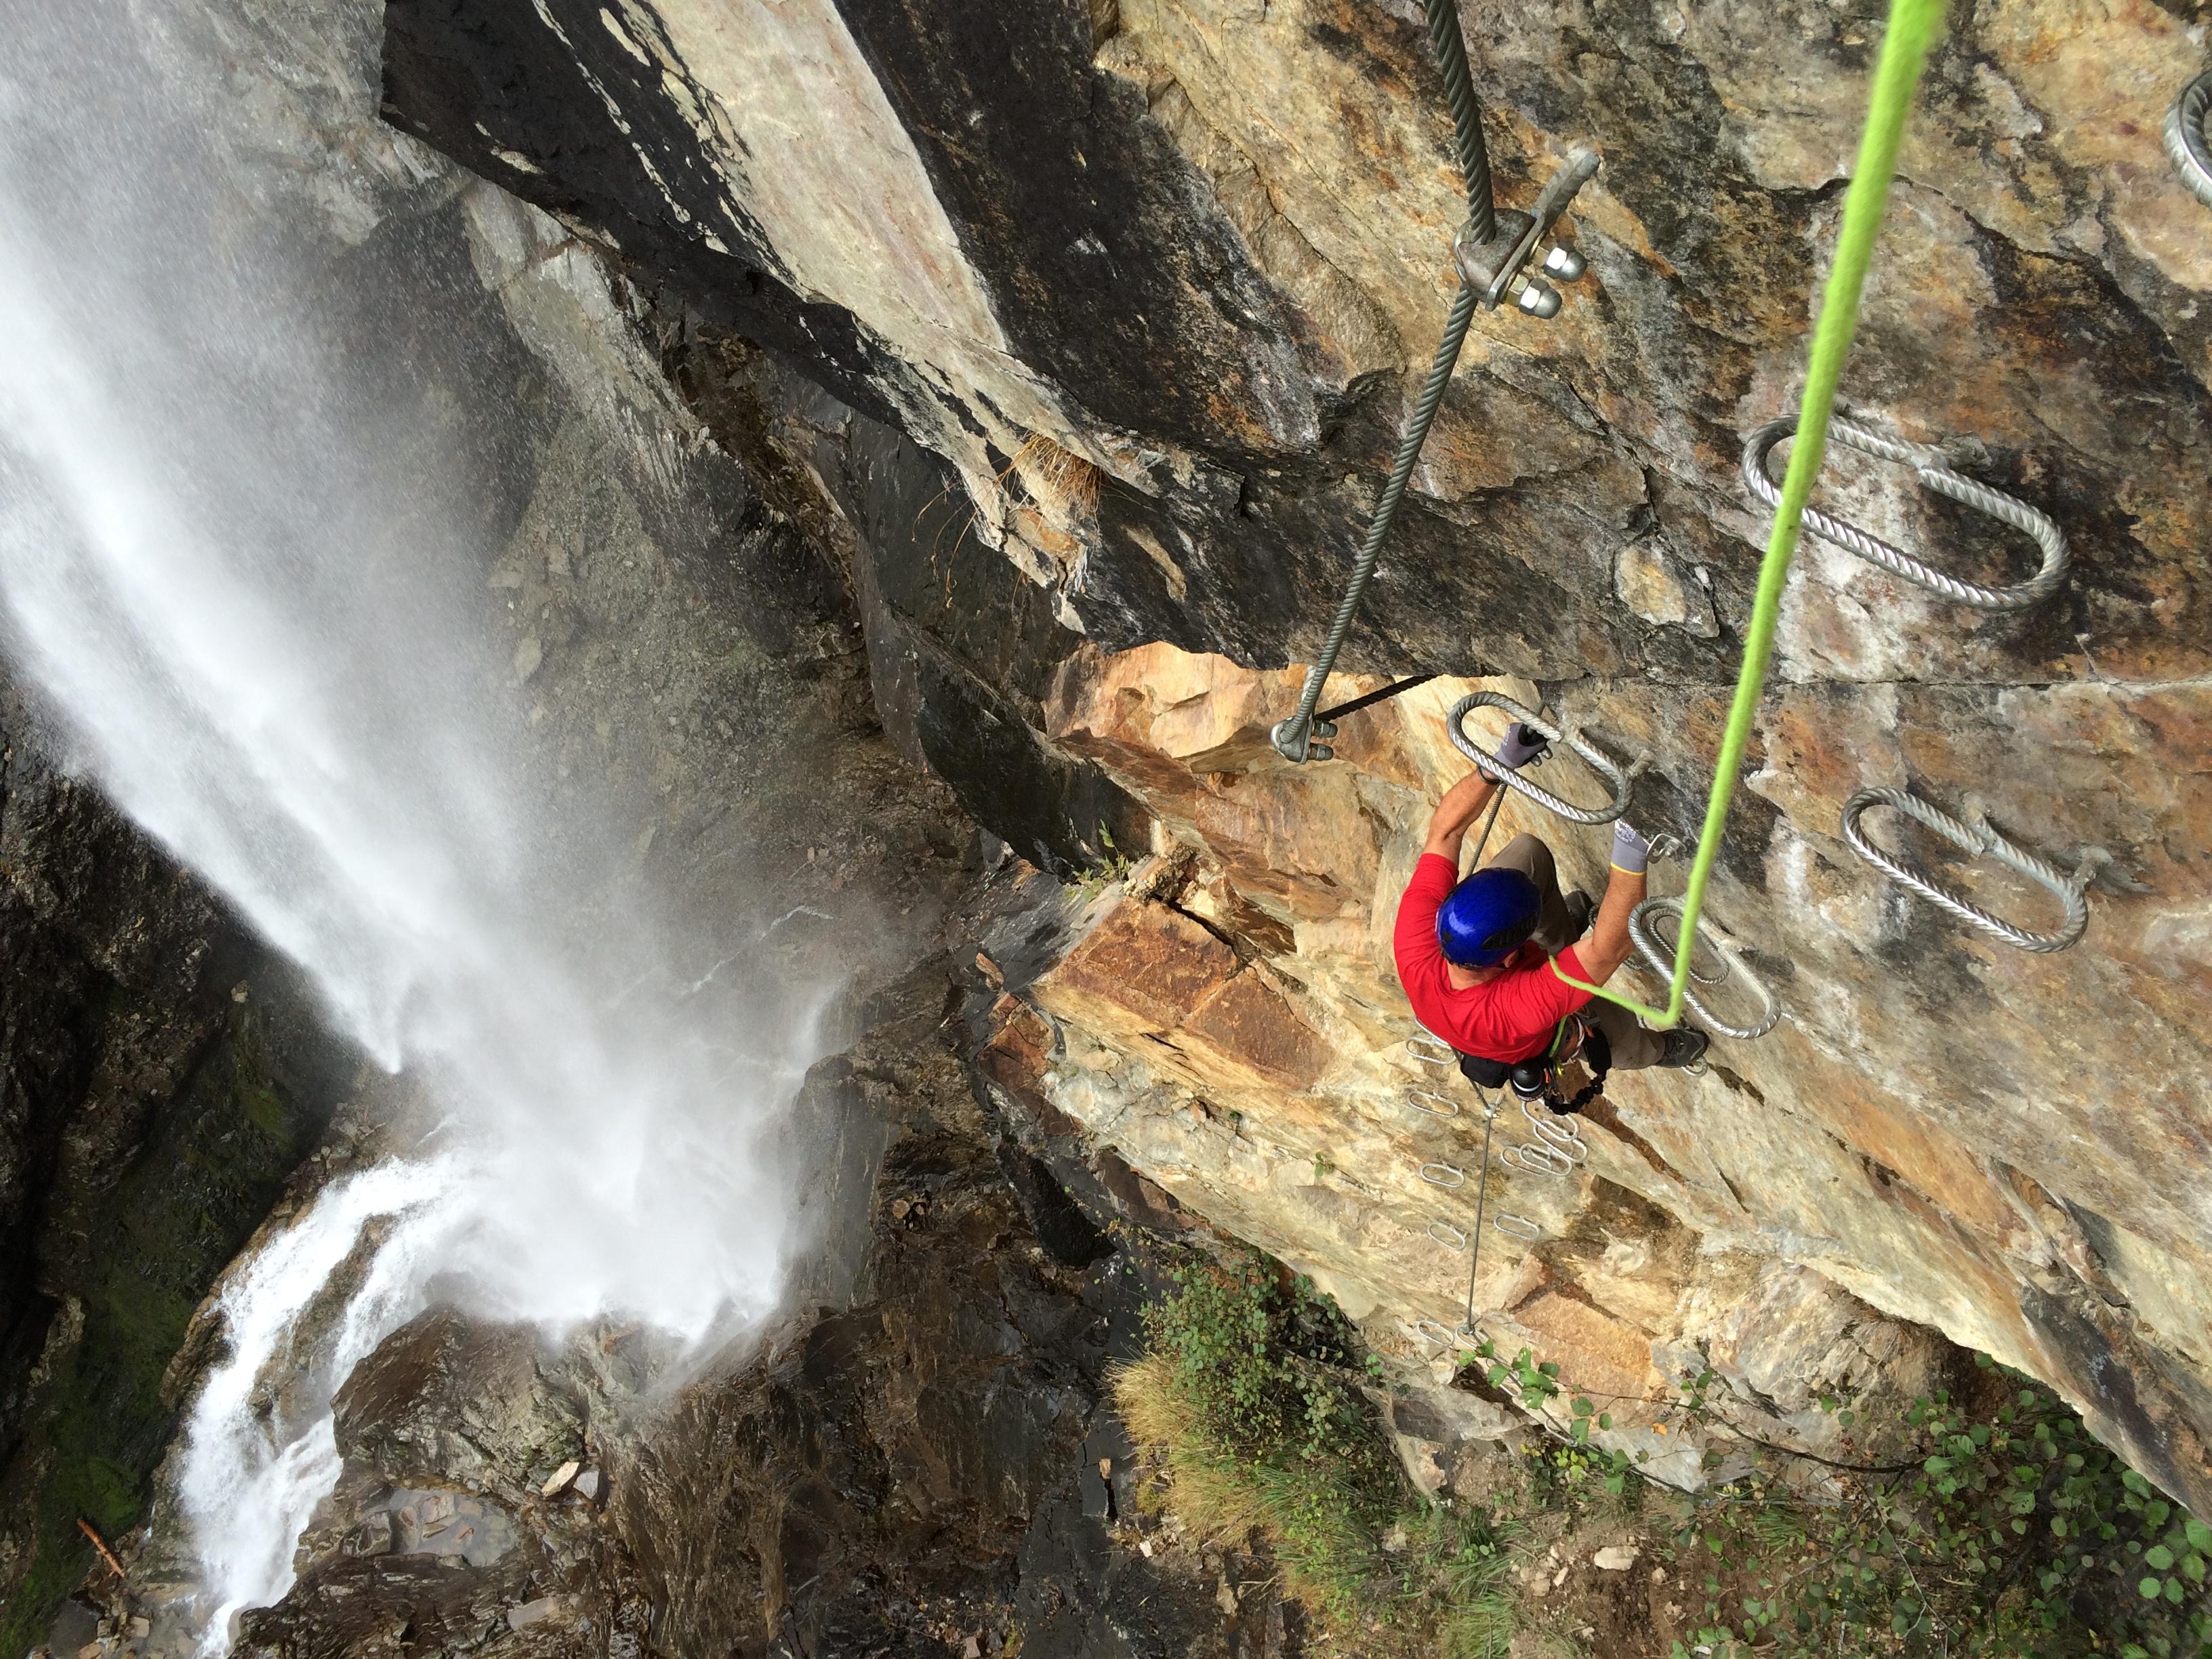 Klettersteig Lehner Wasserfall : Klettersteig lehner wasserfall climbers paradise